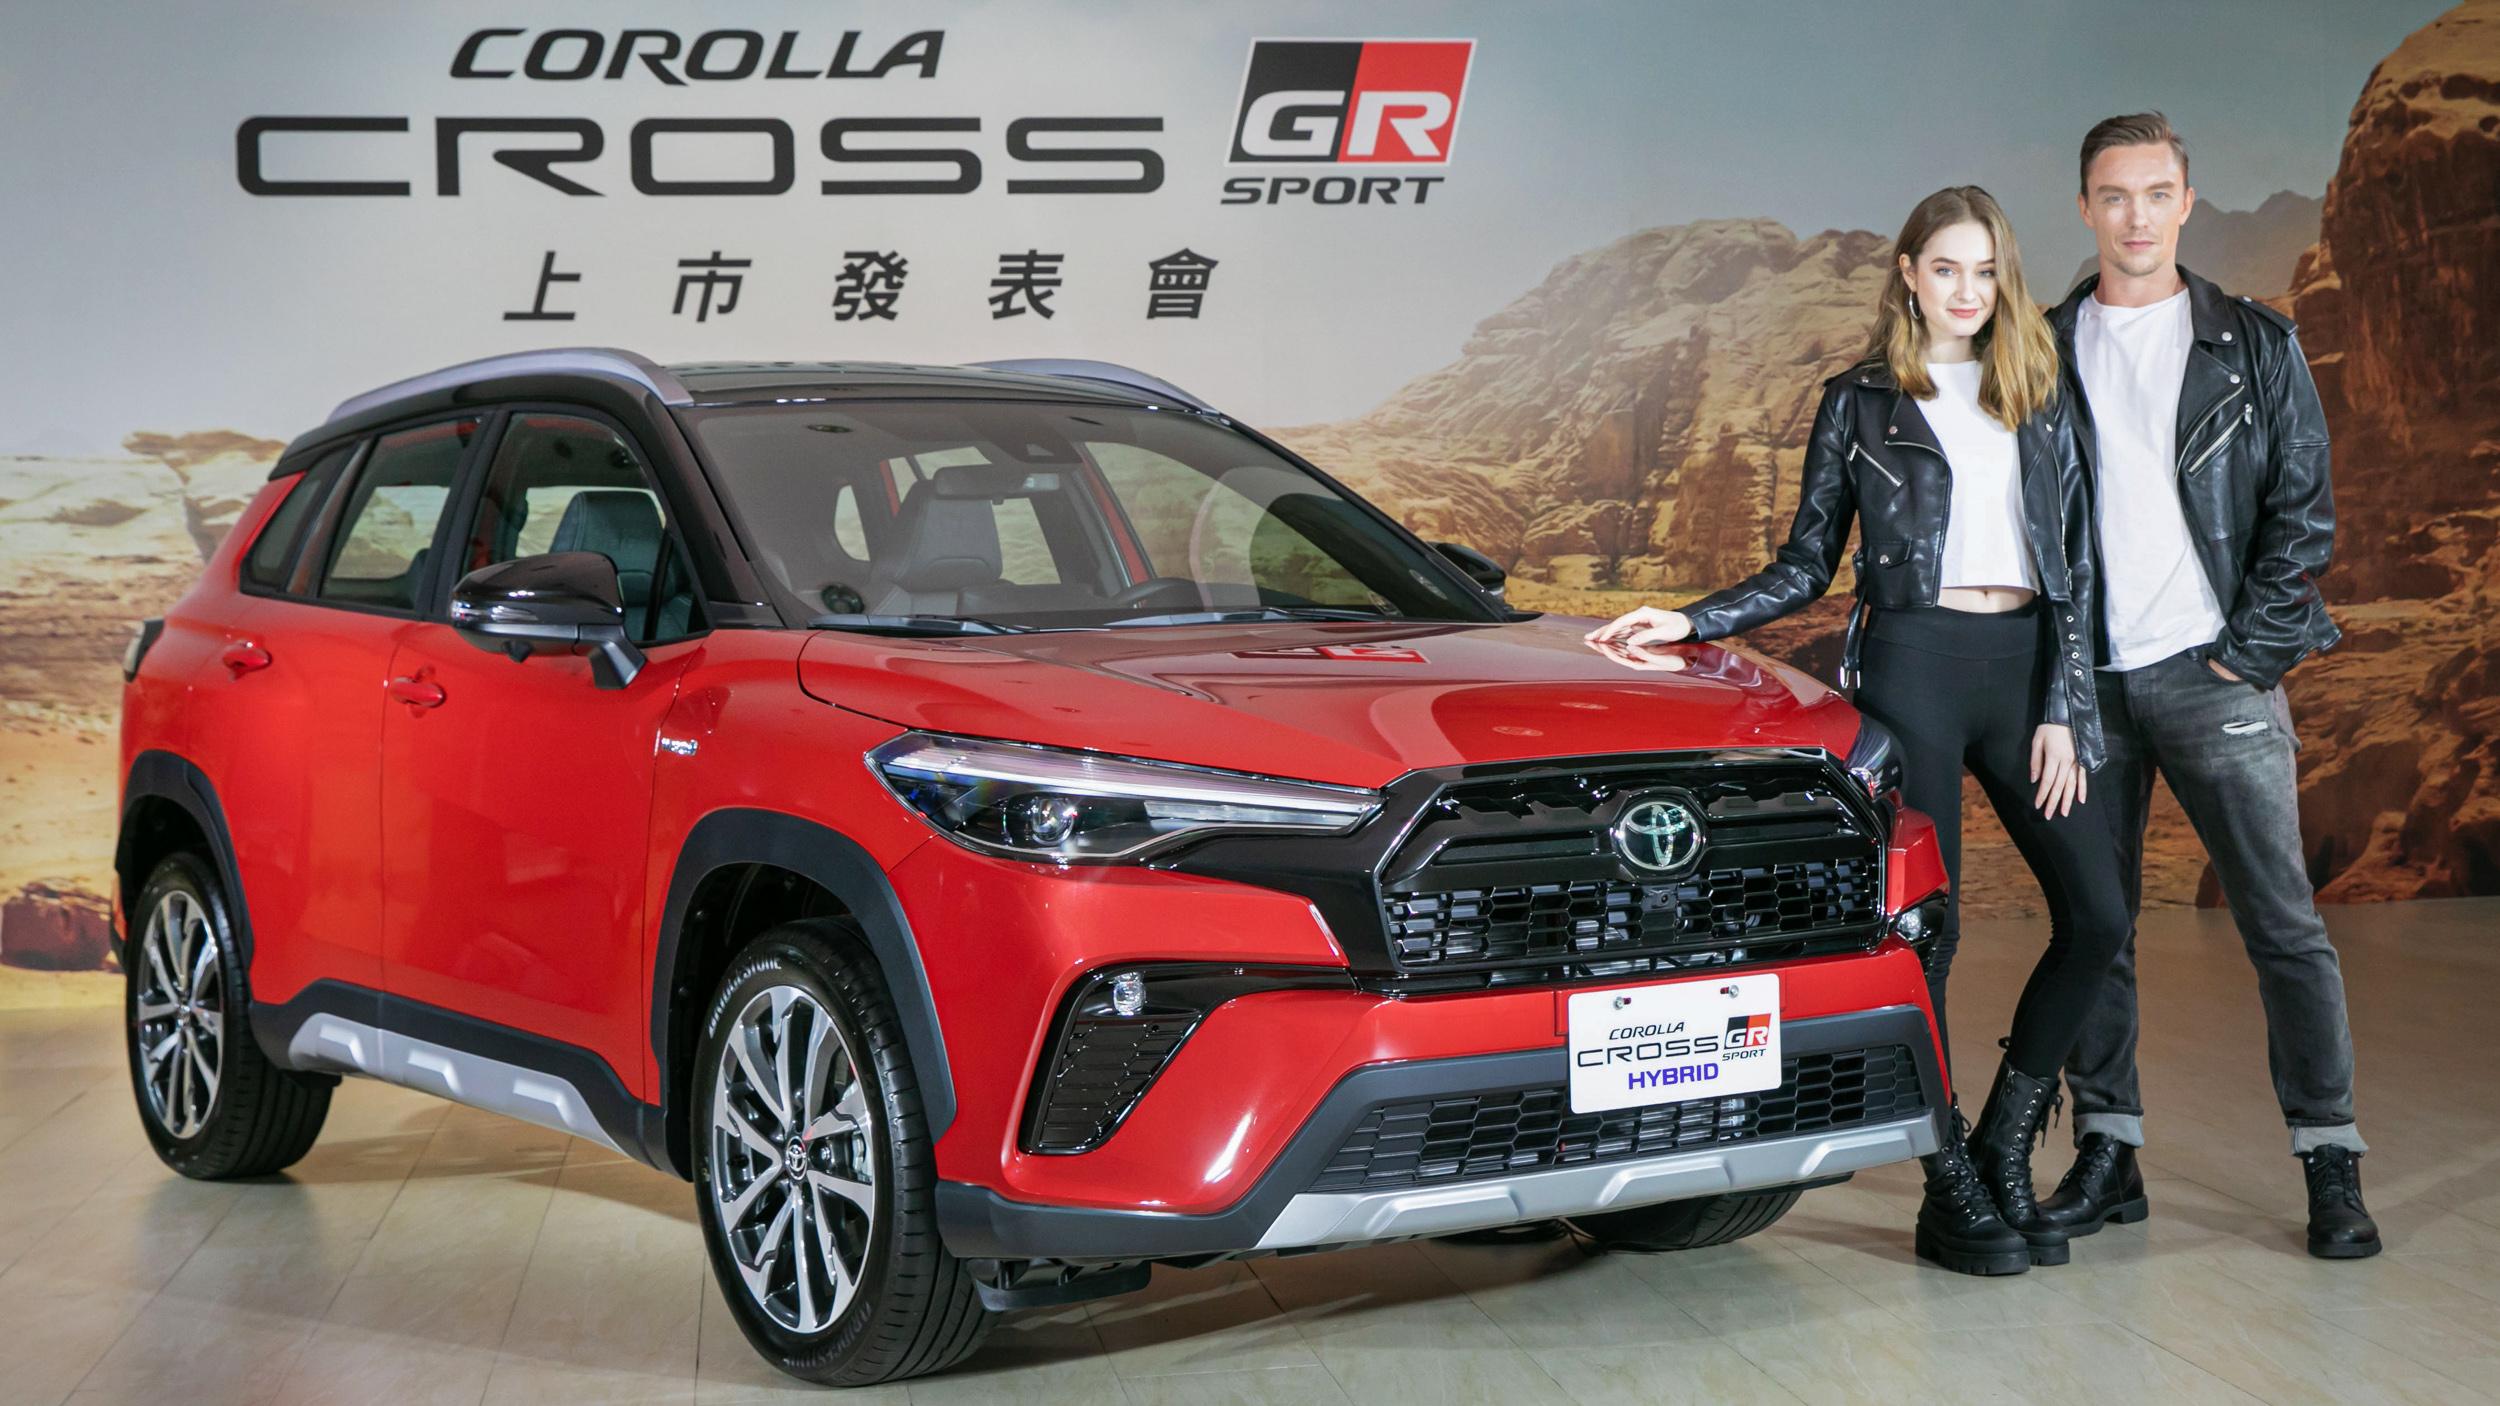 Toyota Corolla Cross 一年賣出 4.2 萬輛還不夠?新推購車優惠方案!